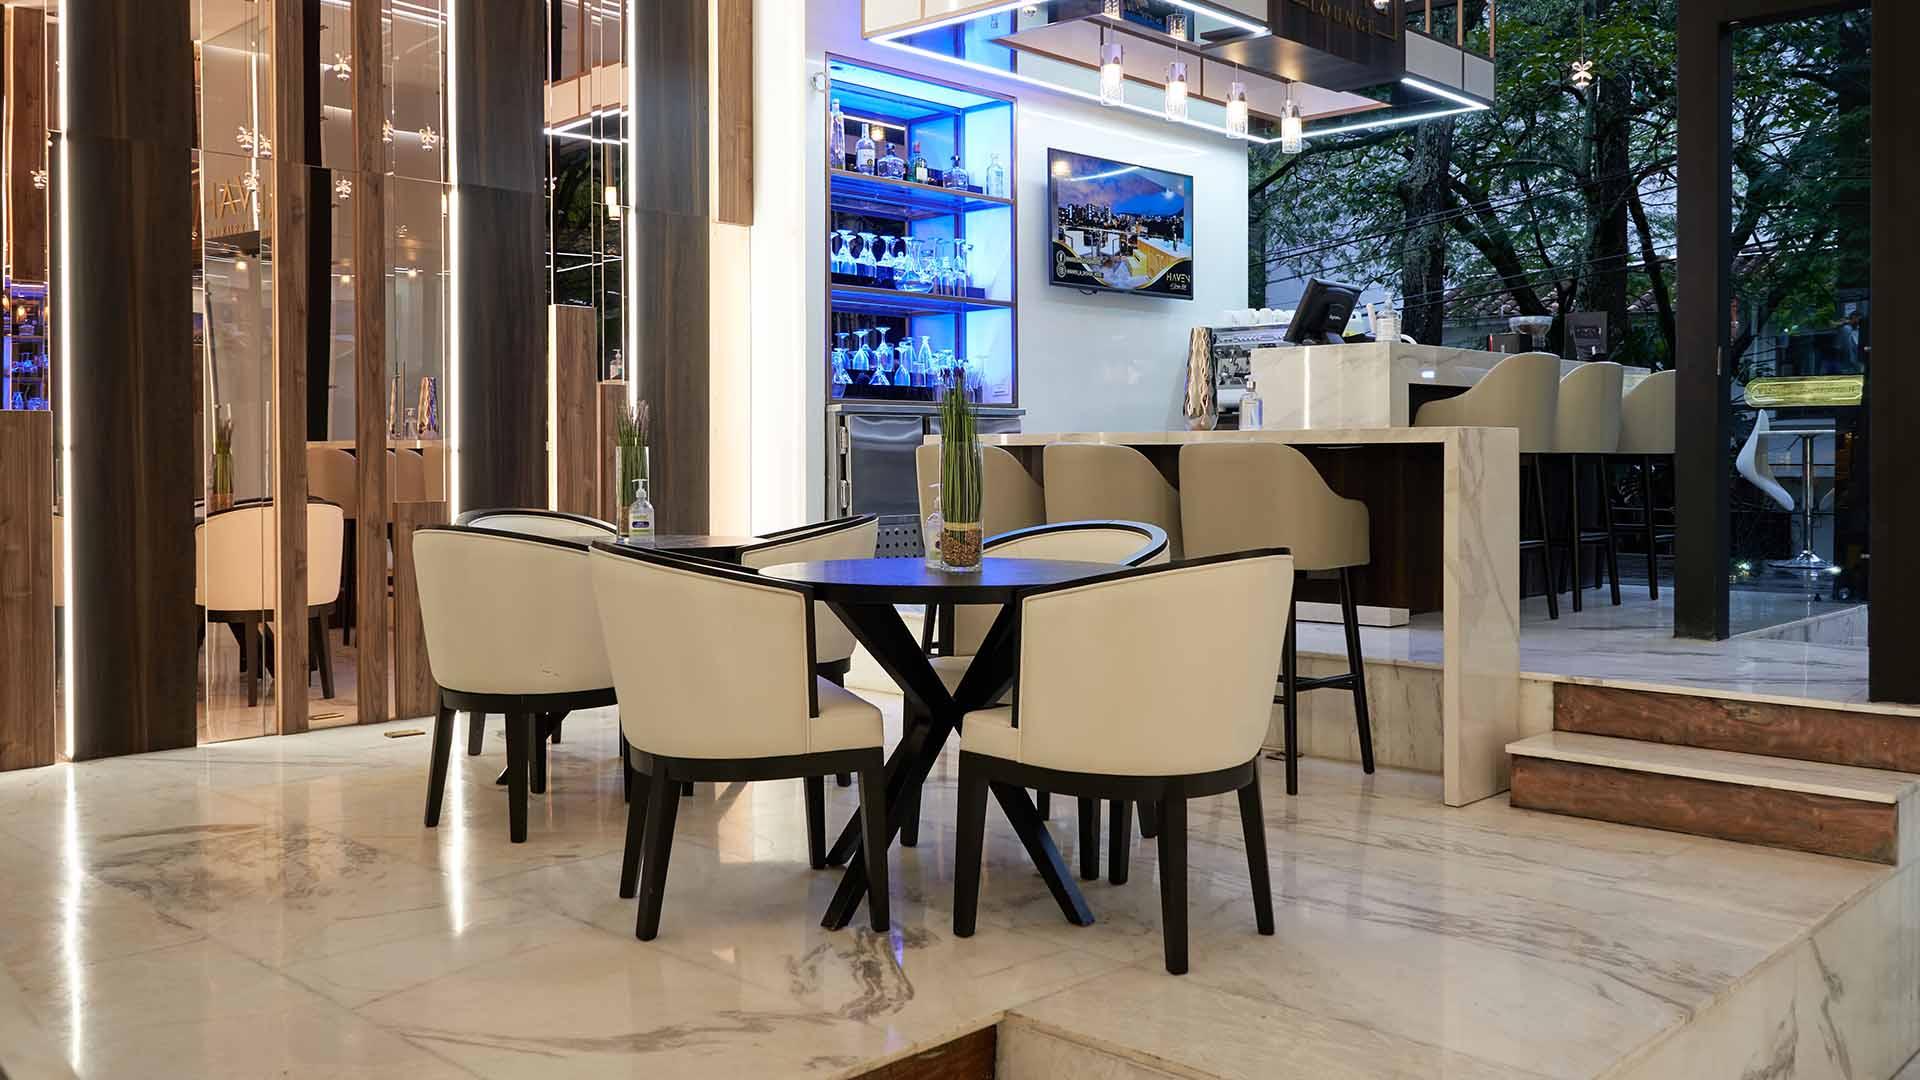 Restaurant in Medellin with Mini Bar